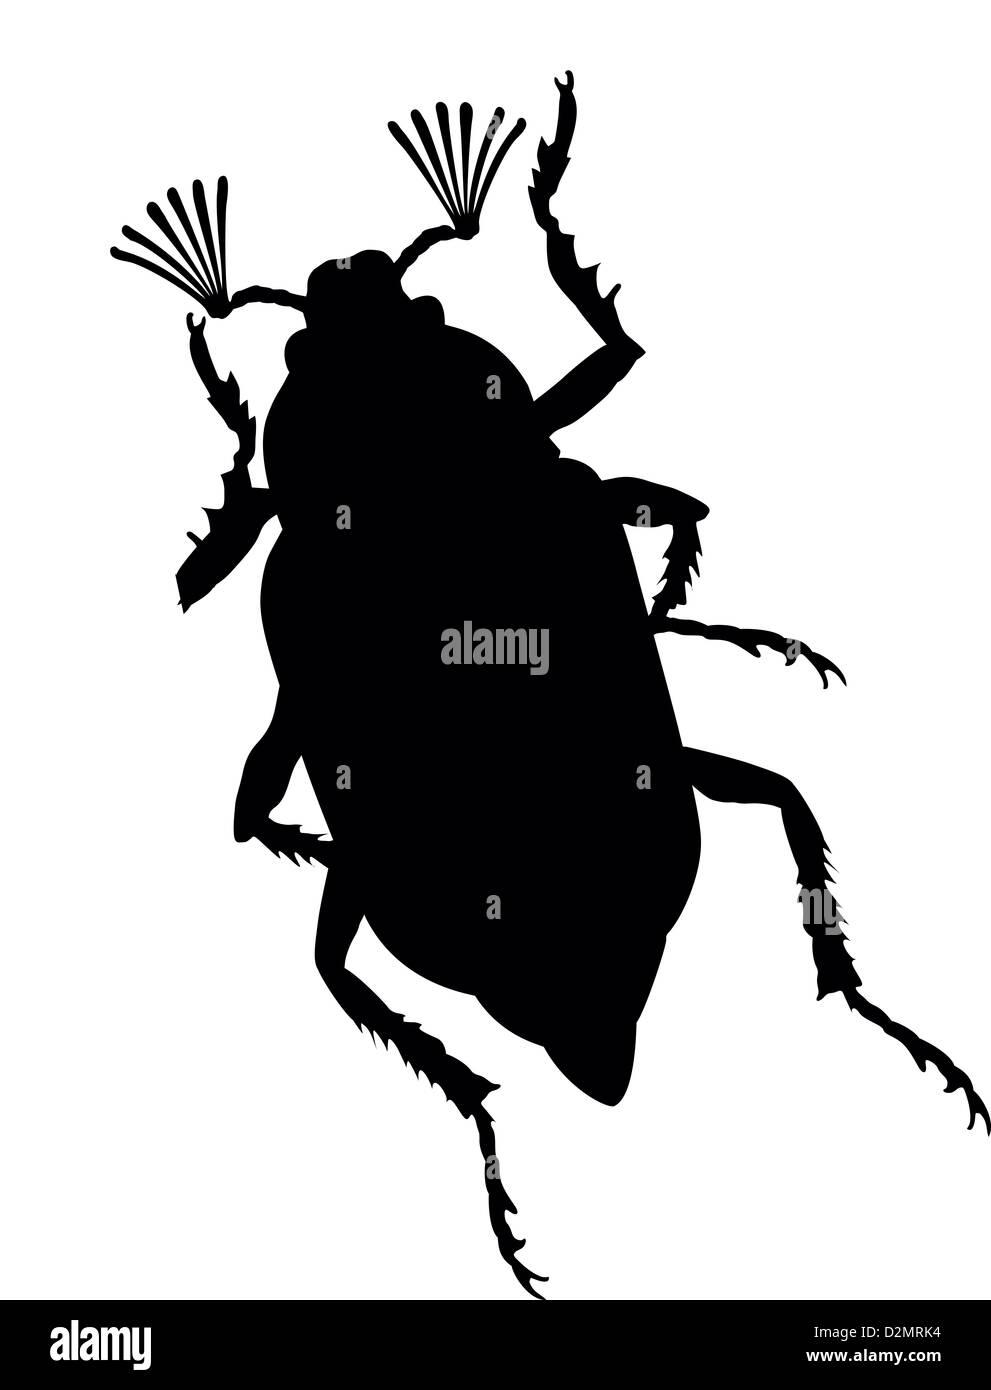 Maybug vector silhouette. Stock Photo